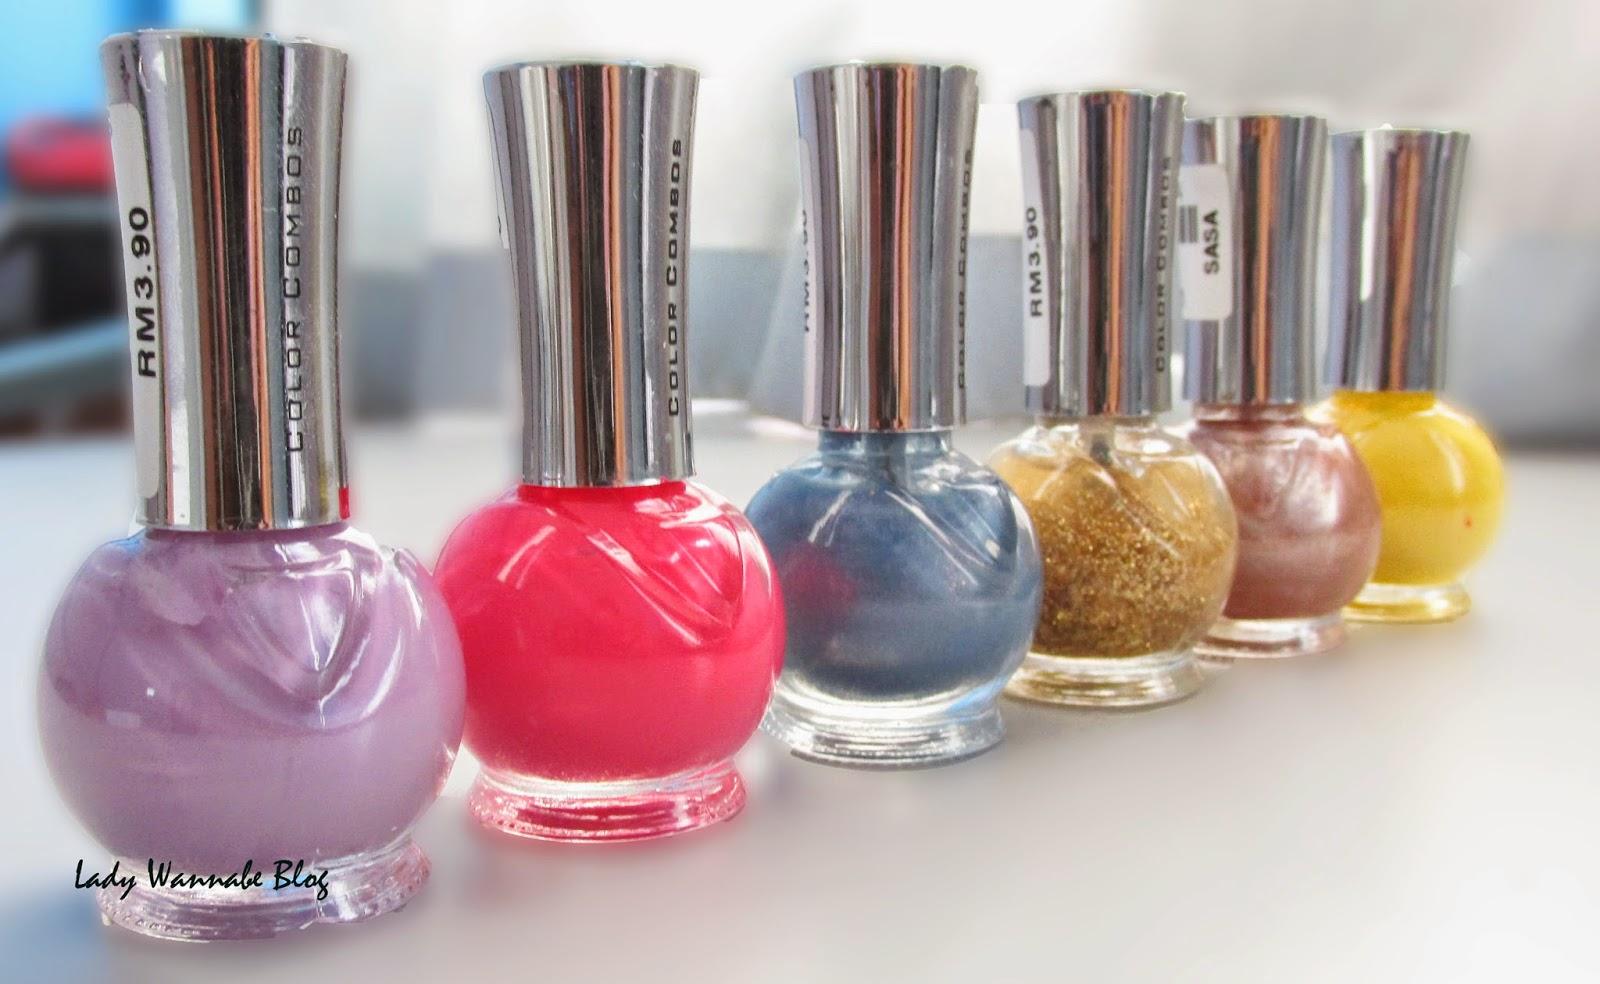 Lady Wannabe Blog: Color Combos Nail Polishes